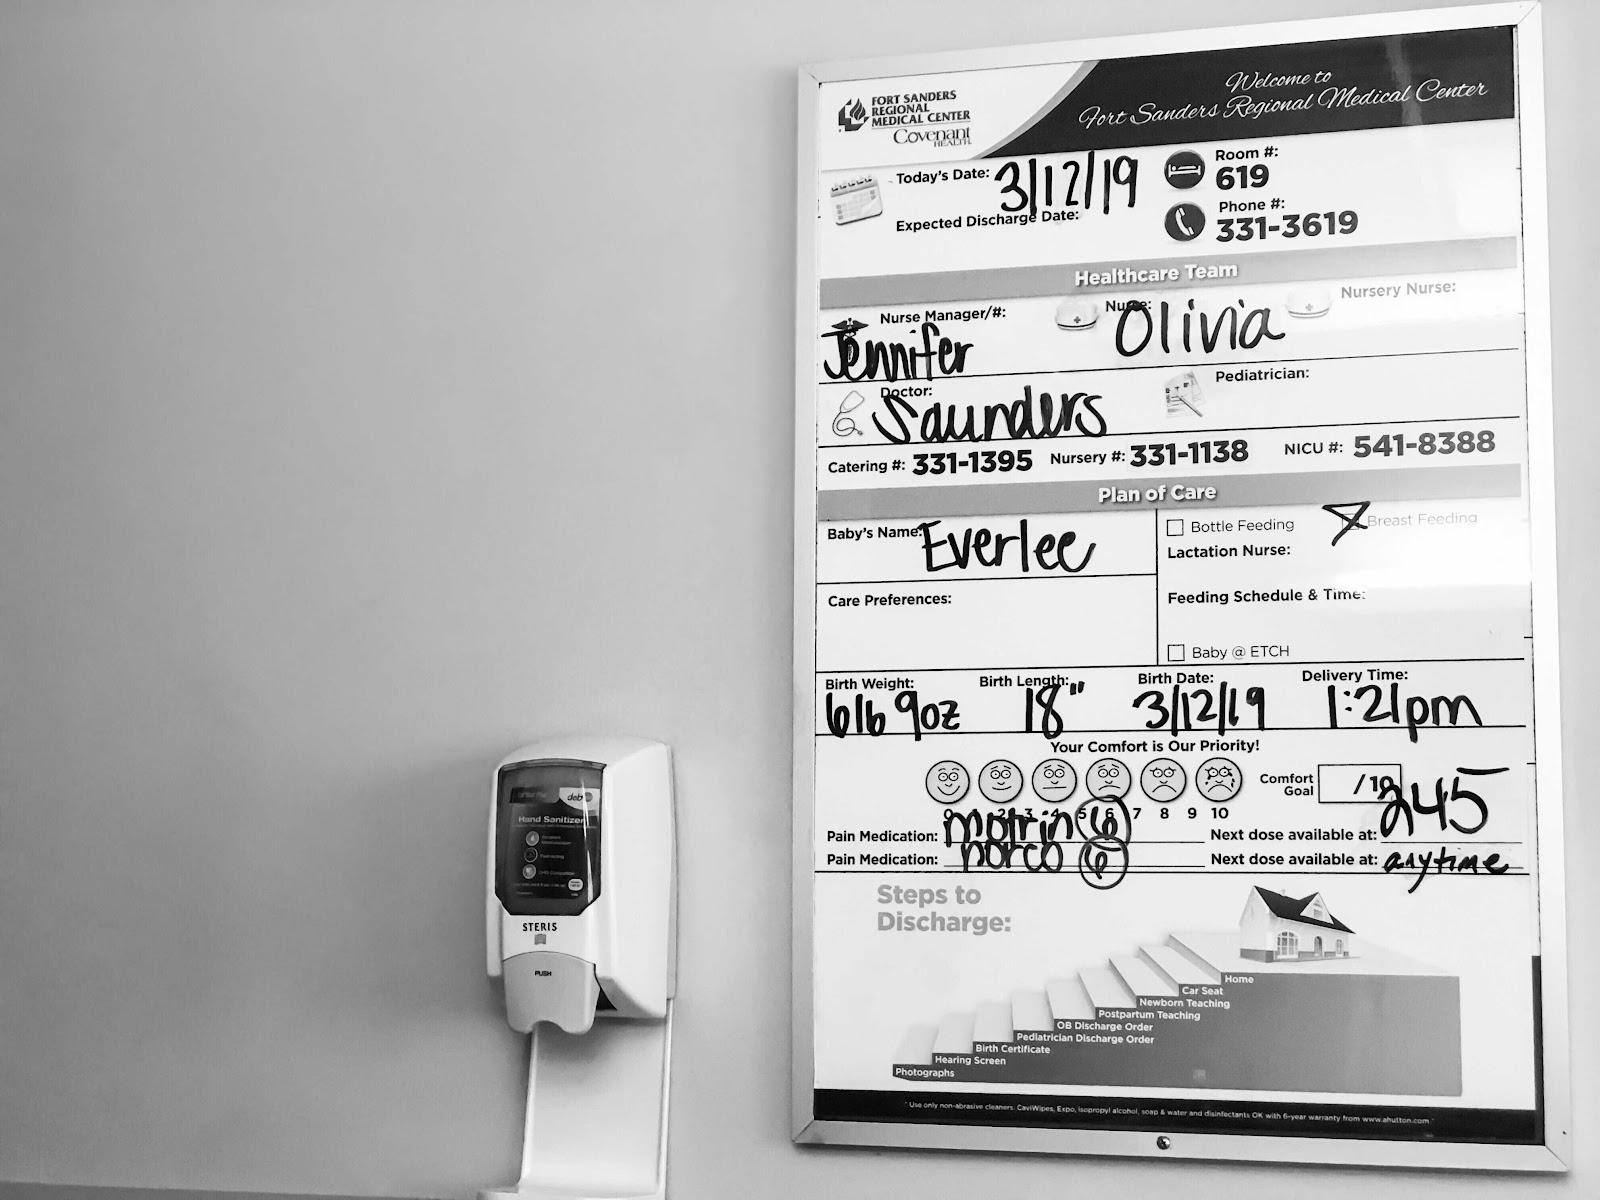 Everlee's Labor | Birth Story & Updates!